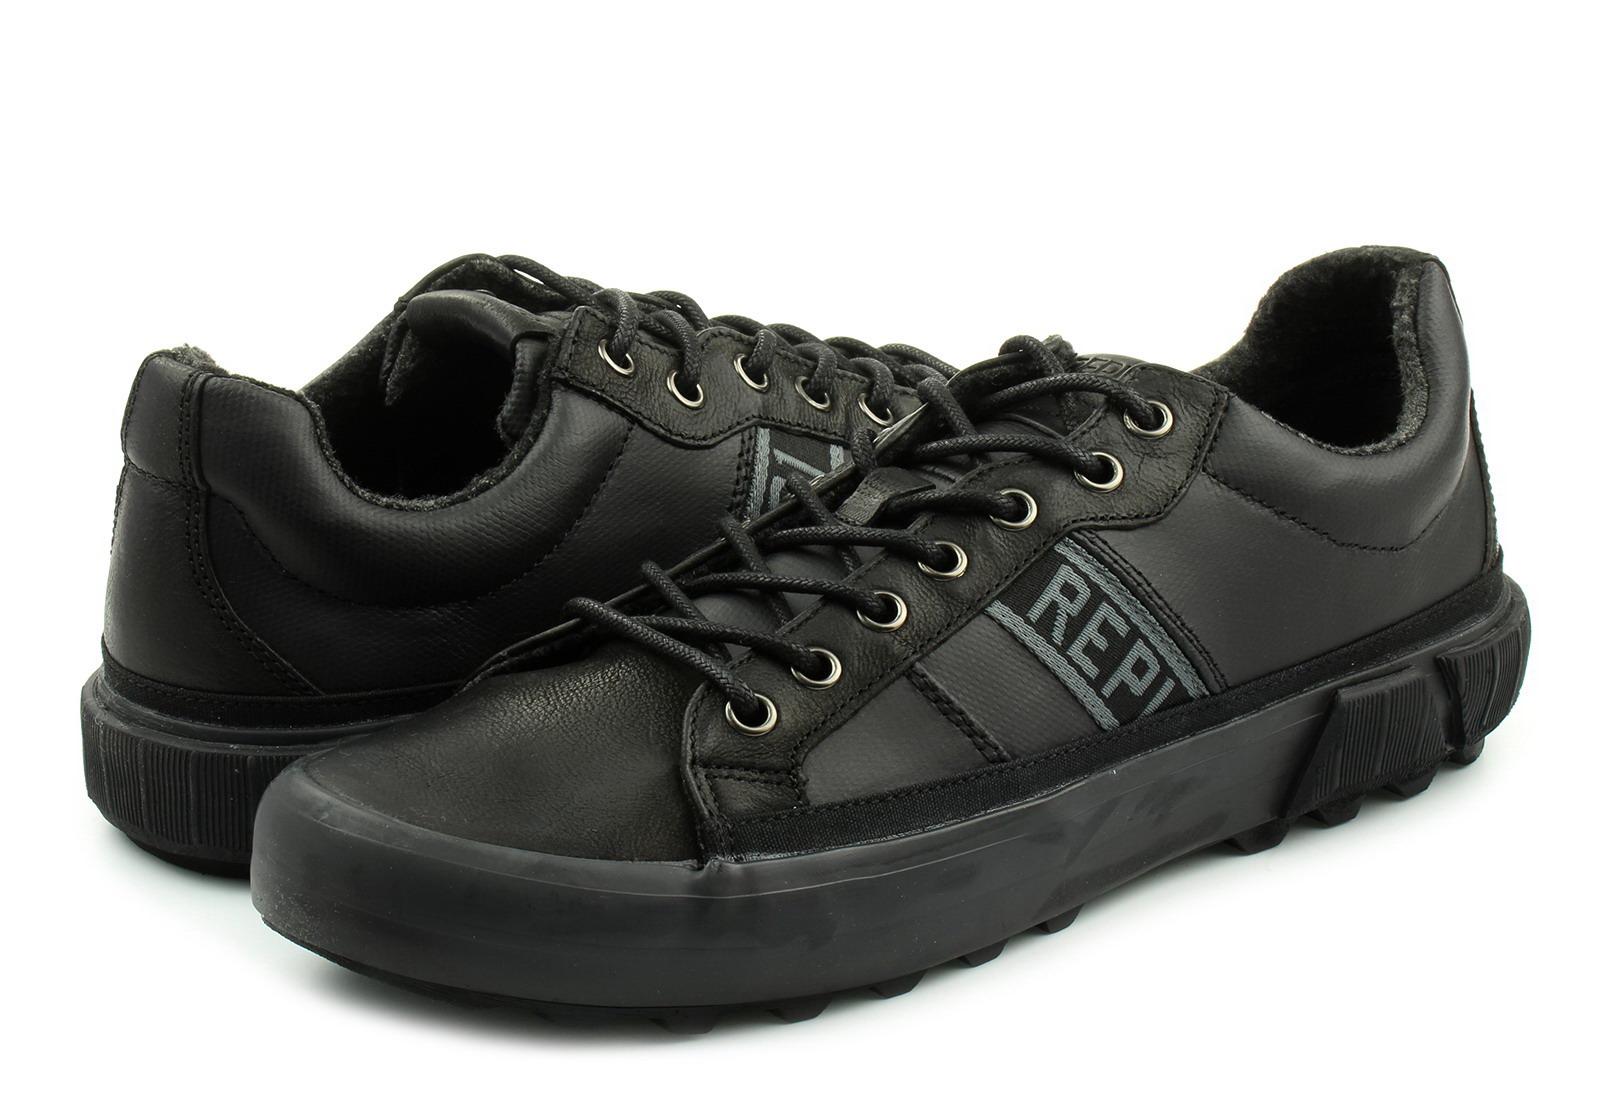 Replay Cipő - Rv760013s - RV760013S-0003 - Office Shoes Magyarország 4d63b6e1d4